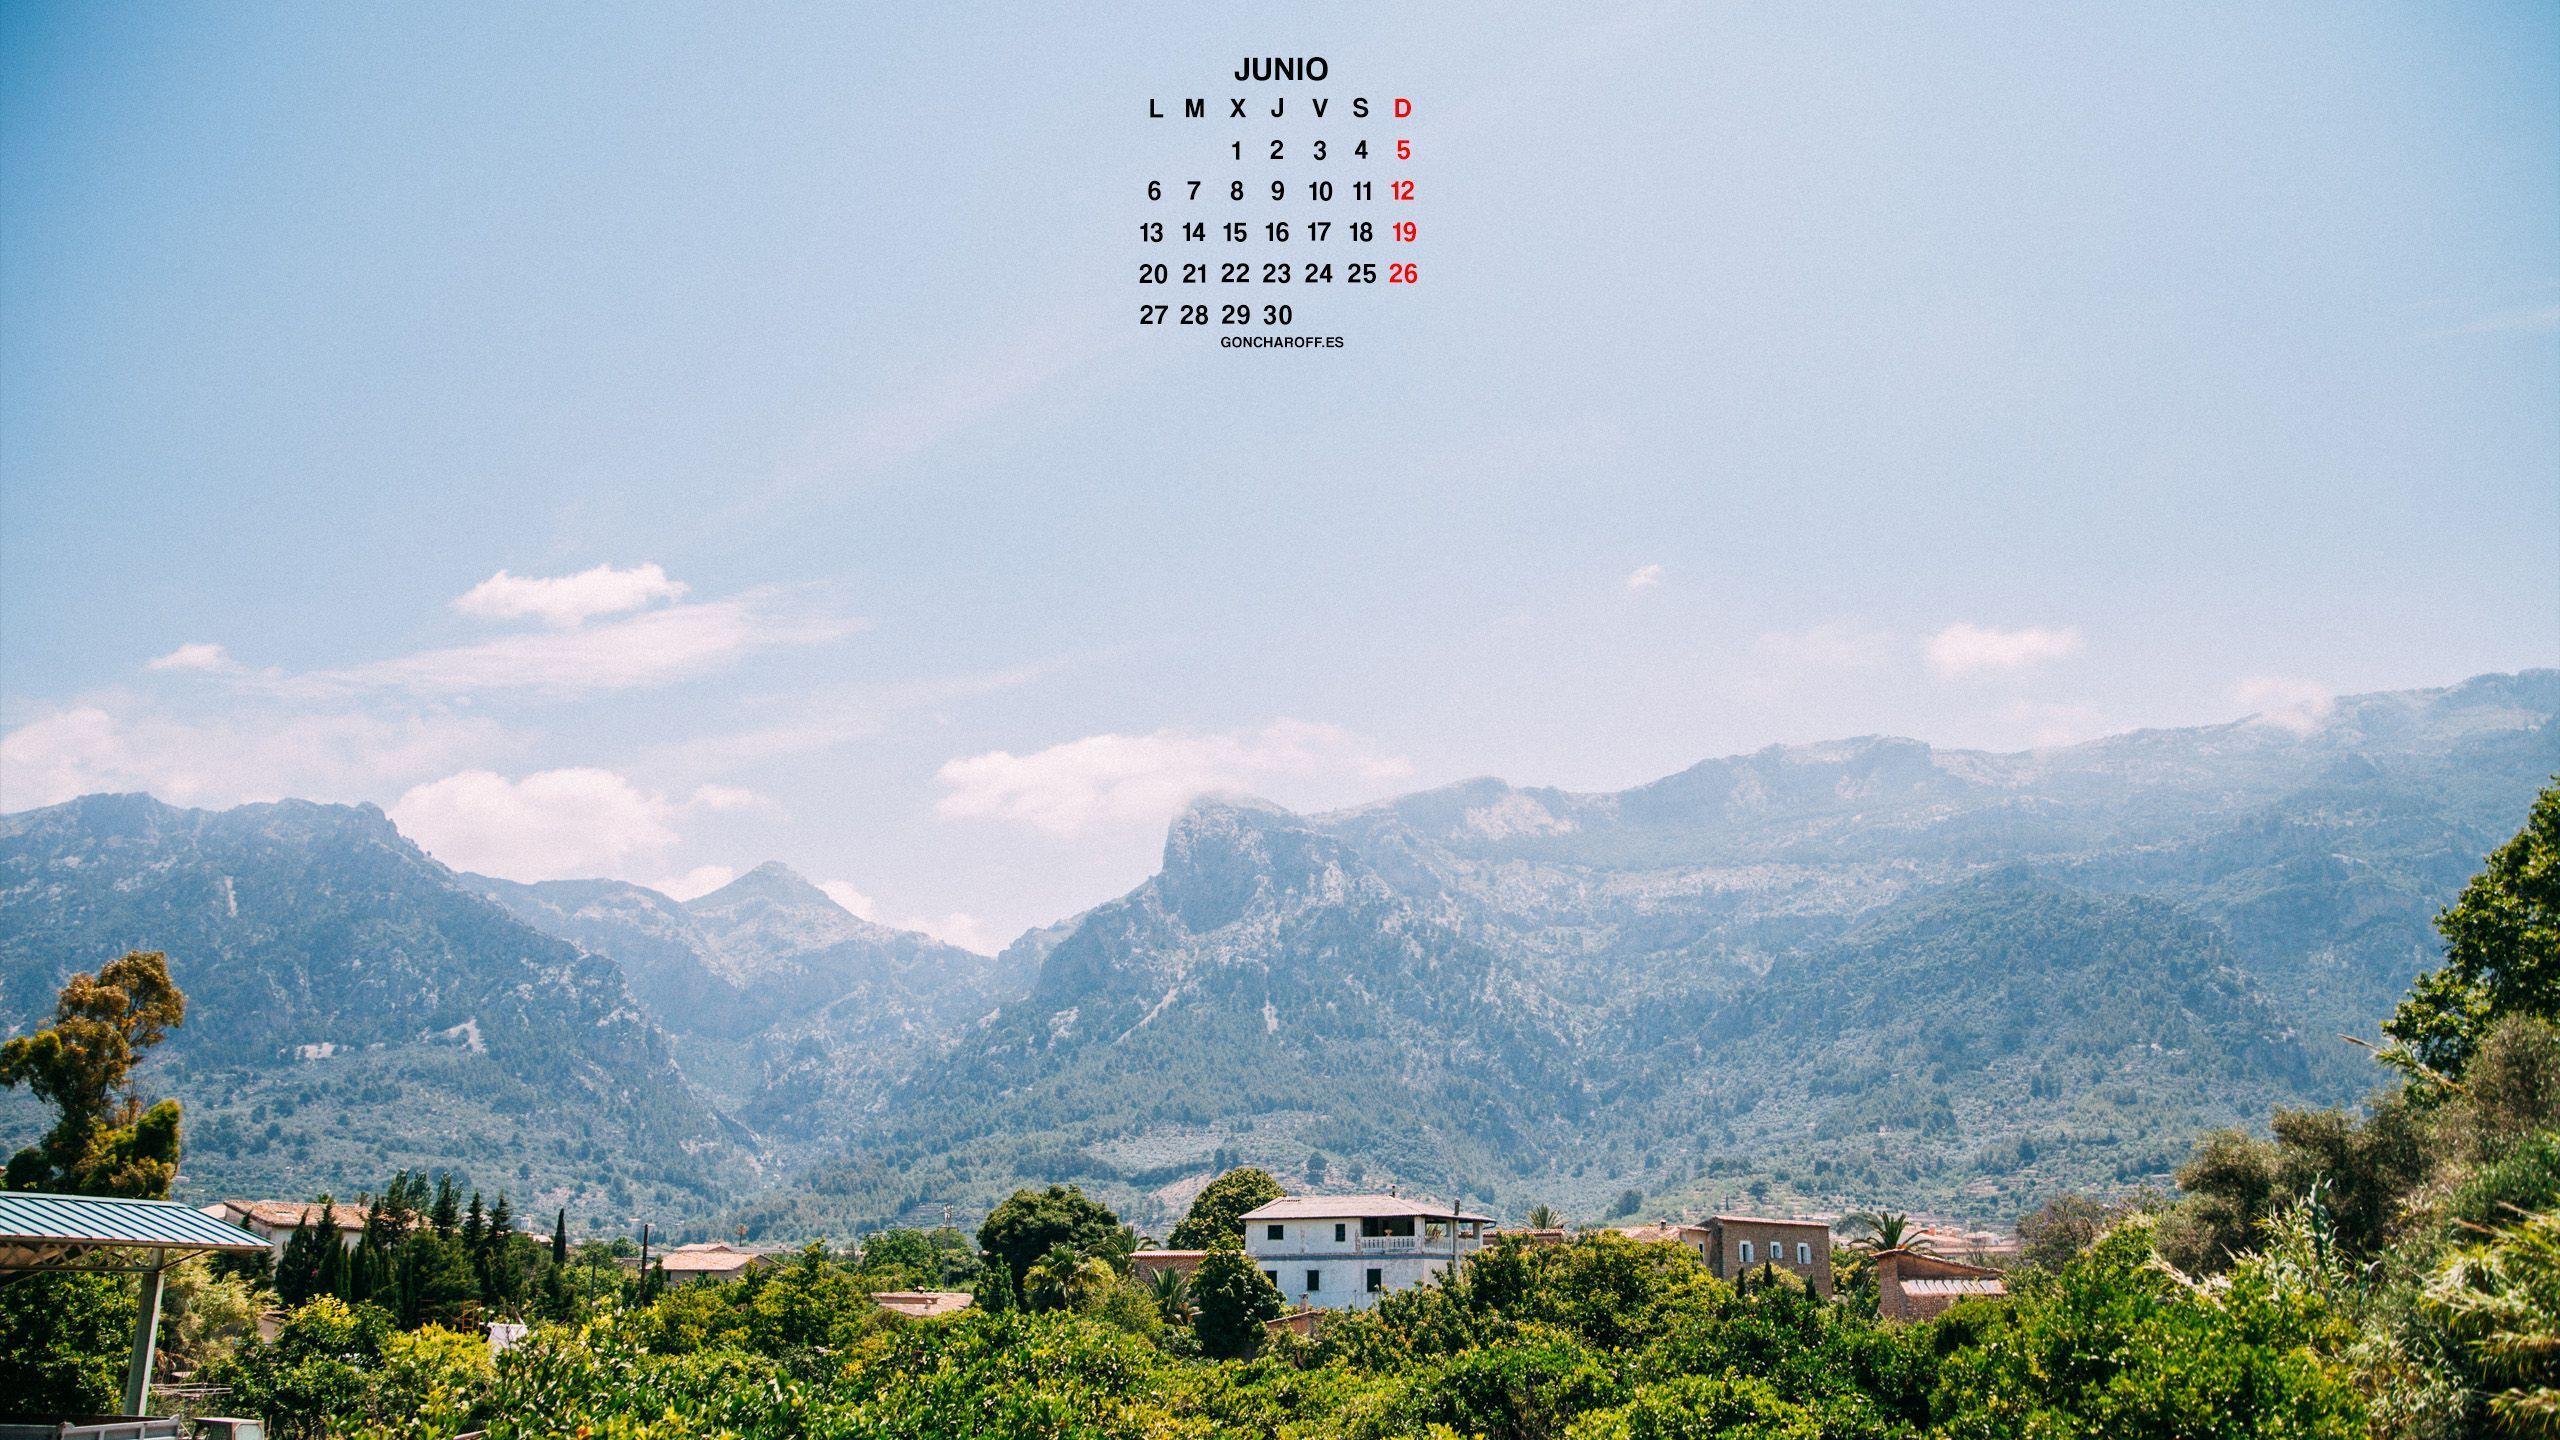 Calendario de Junio 2016 descargar gratis